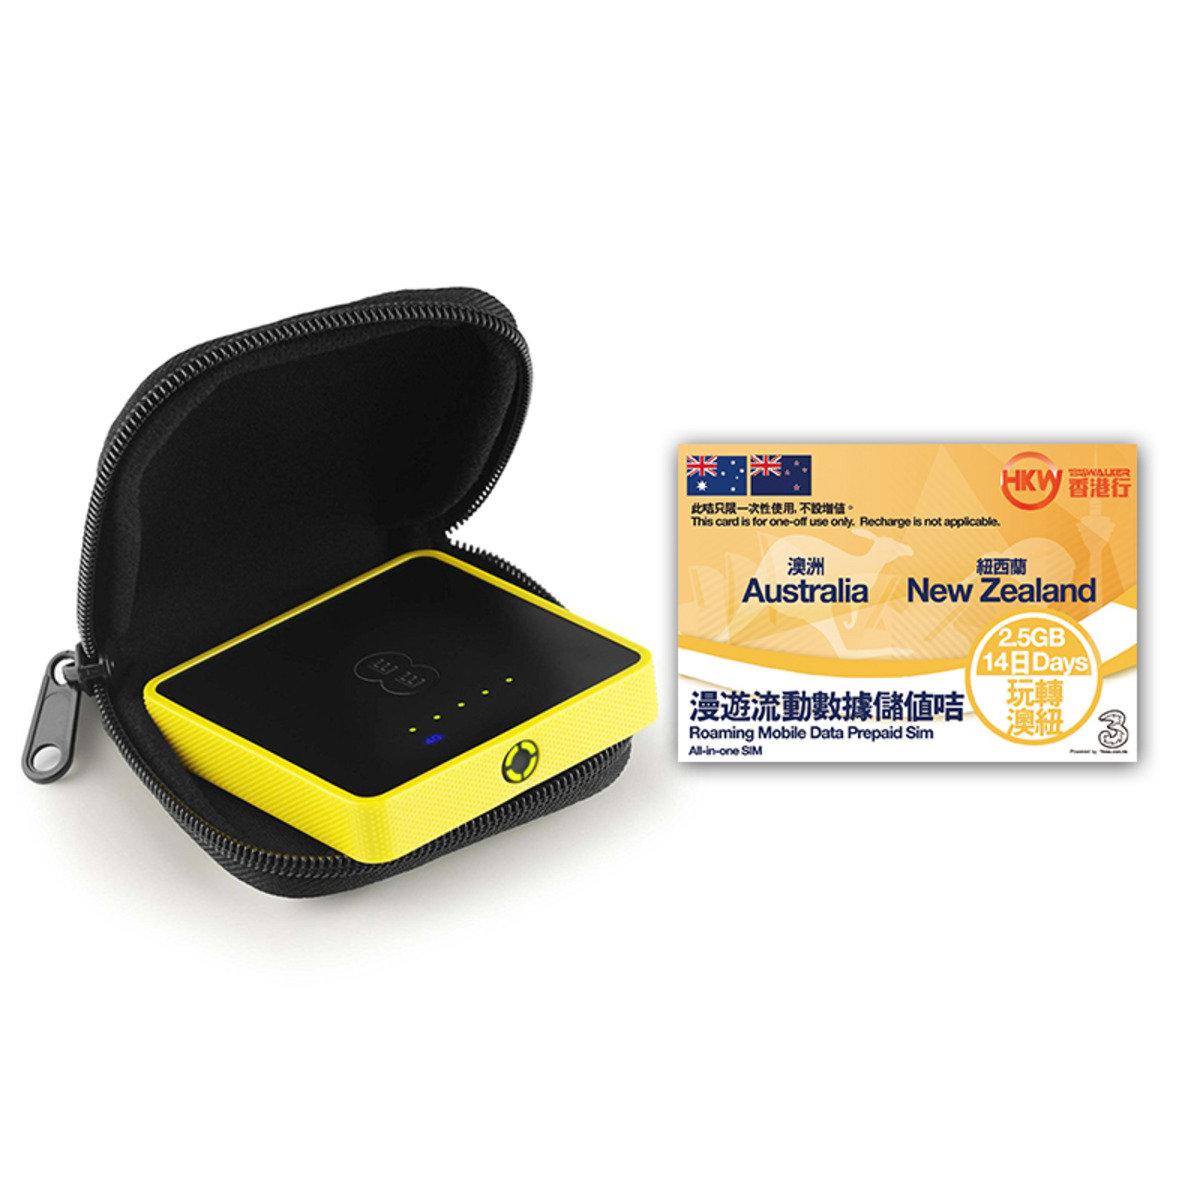 HKWALKER Osprey 2 Mini Wifi蛋 + 14天2.5GB prepaid sim澳紐漫遊數據儲值咭 (expiry date:31-12-2017)